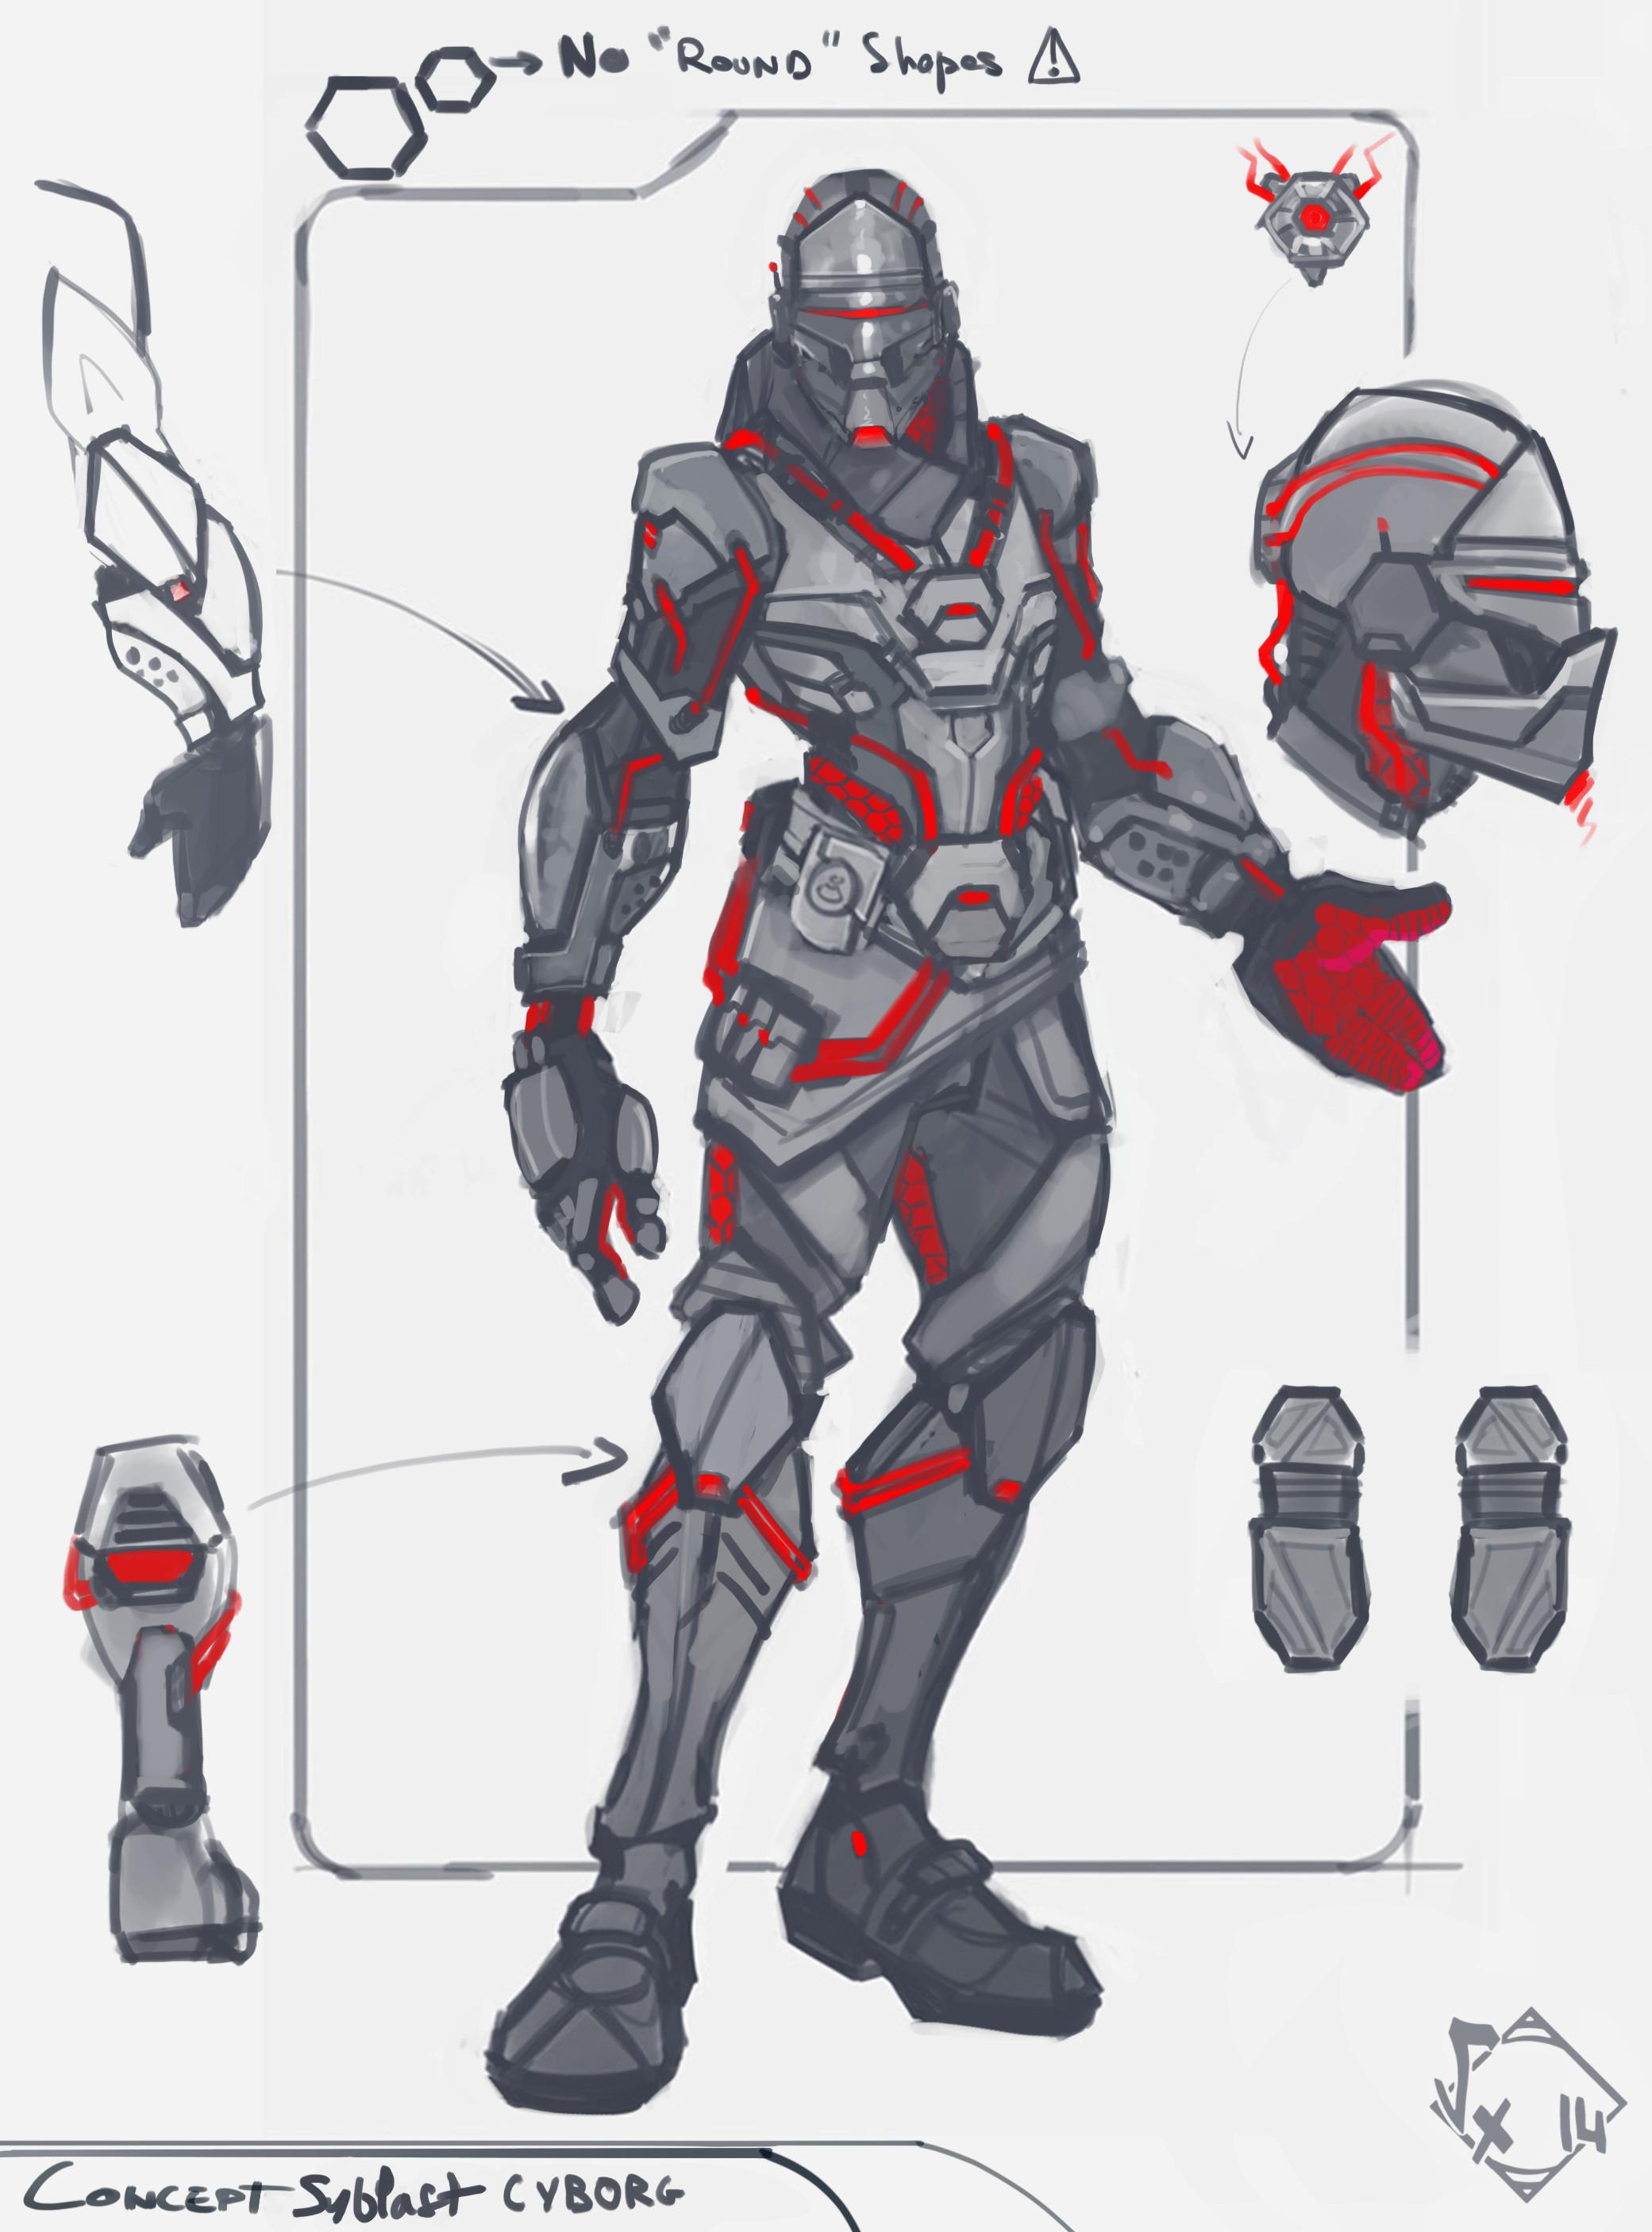 Syblast Cyborg Skin - ConceptArt